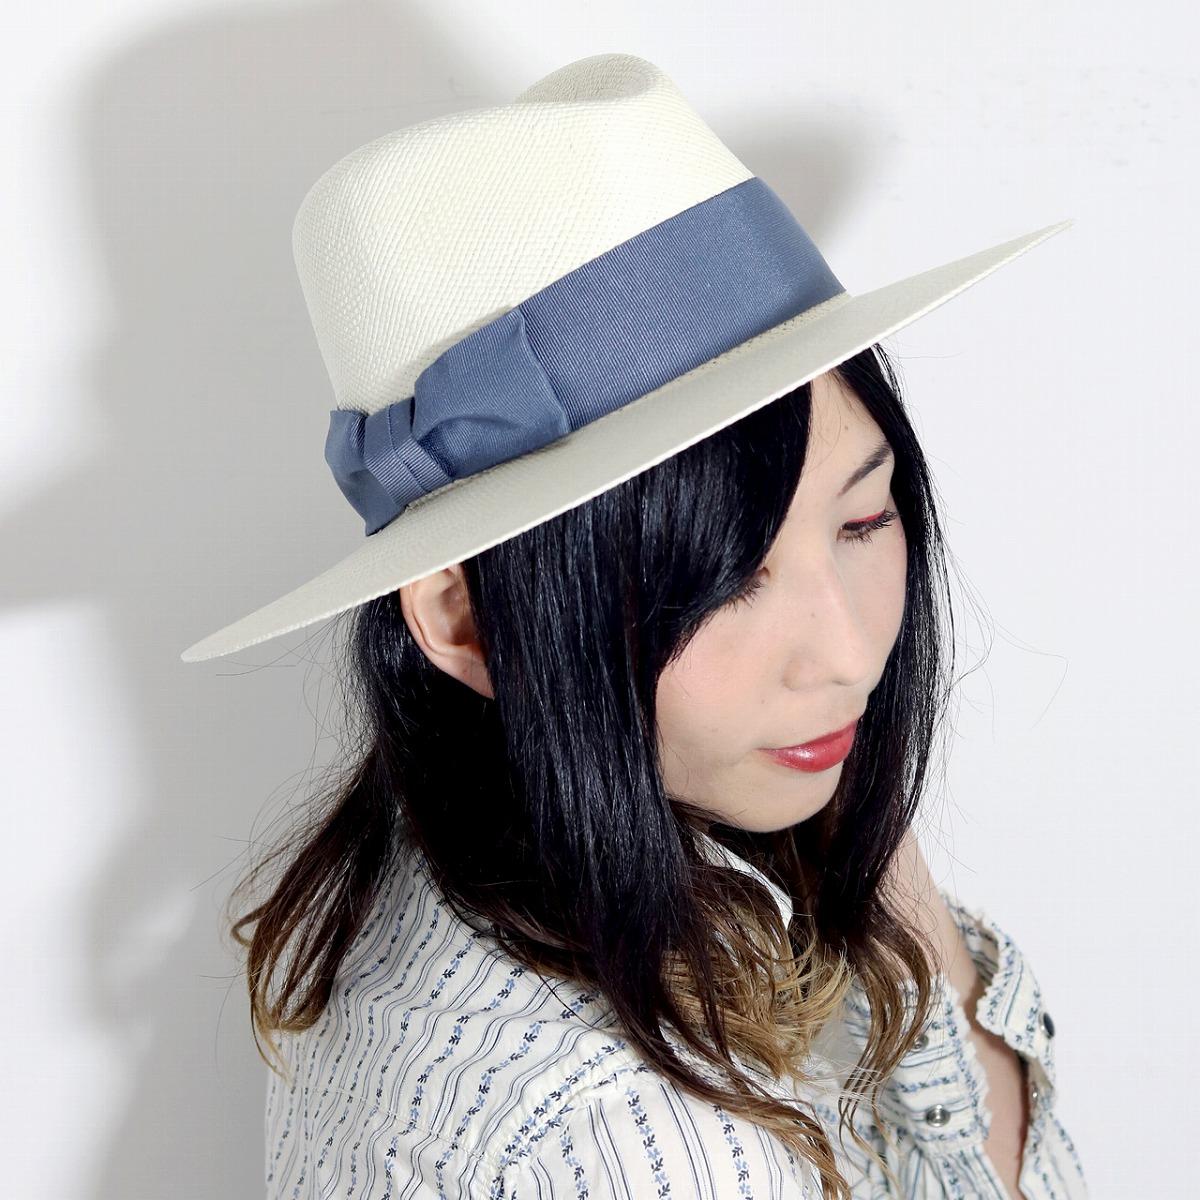 0310812b ELEHELM HAT STORE: Broad-brimmed hat Lady's white Y ditch rim GALLIANO  SORBATT panama hat white straw hat Mrs. hat Panama hat Mrs. awning saliva wide  hat ...